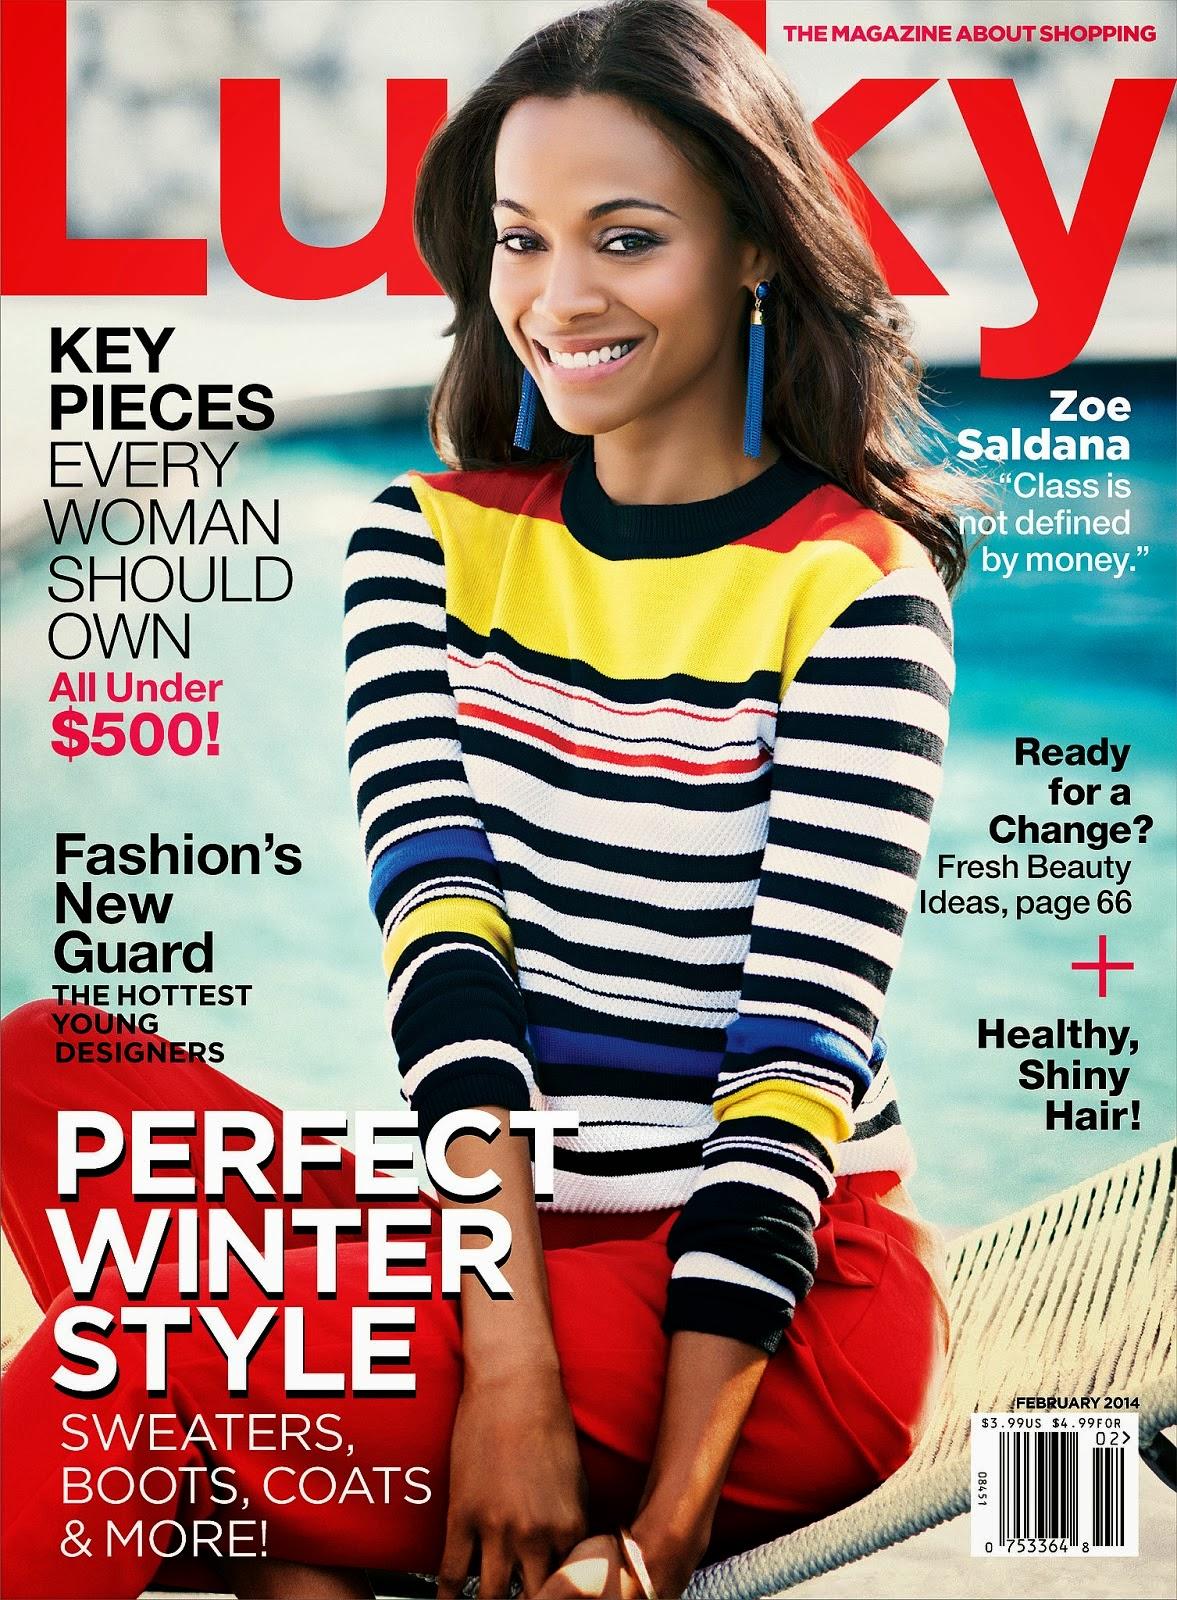 Lucky Magazine May 11: Smartologie: Zoe Saldana For Lucky Magazine February 2014